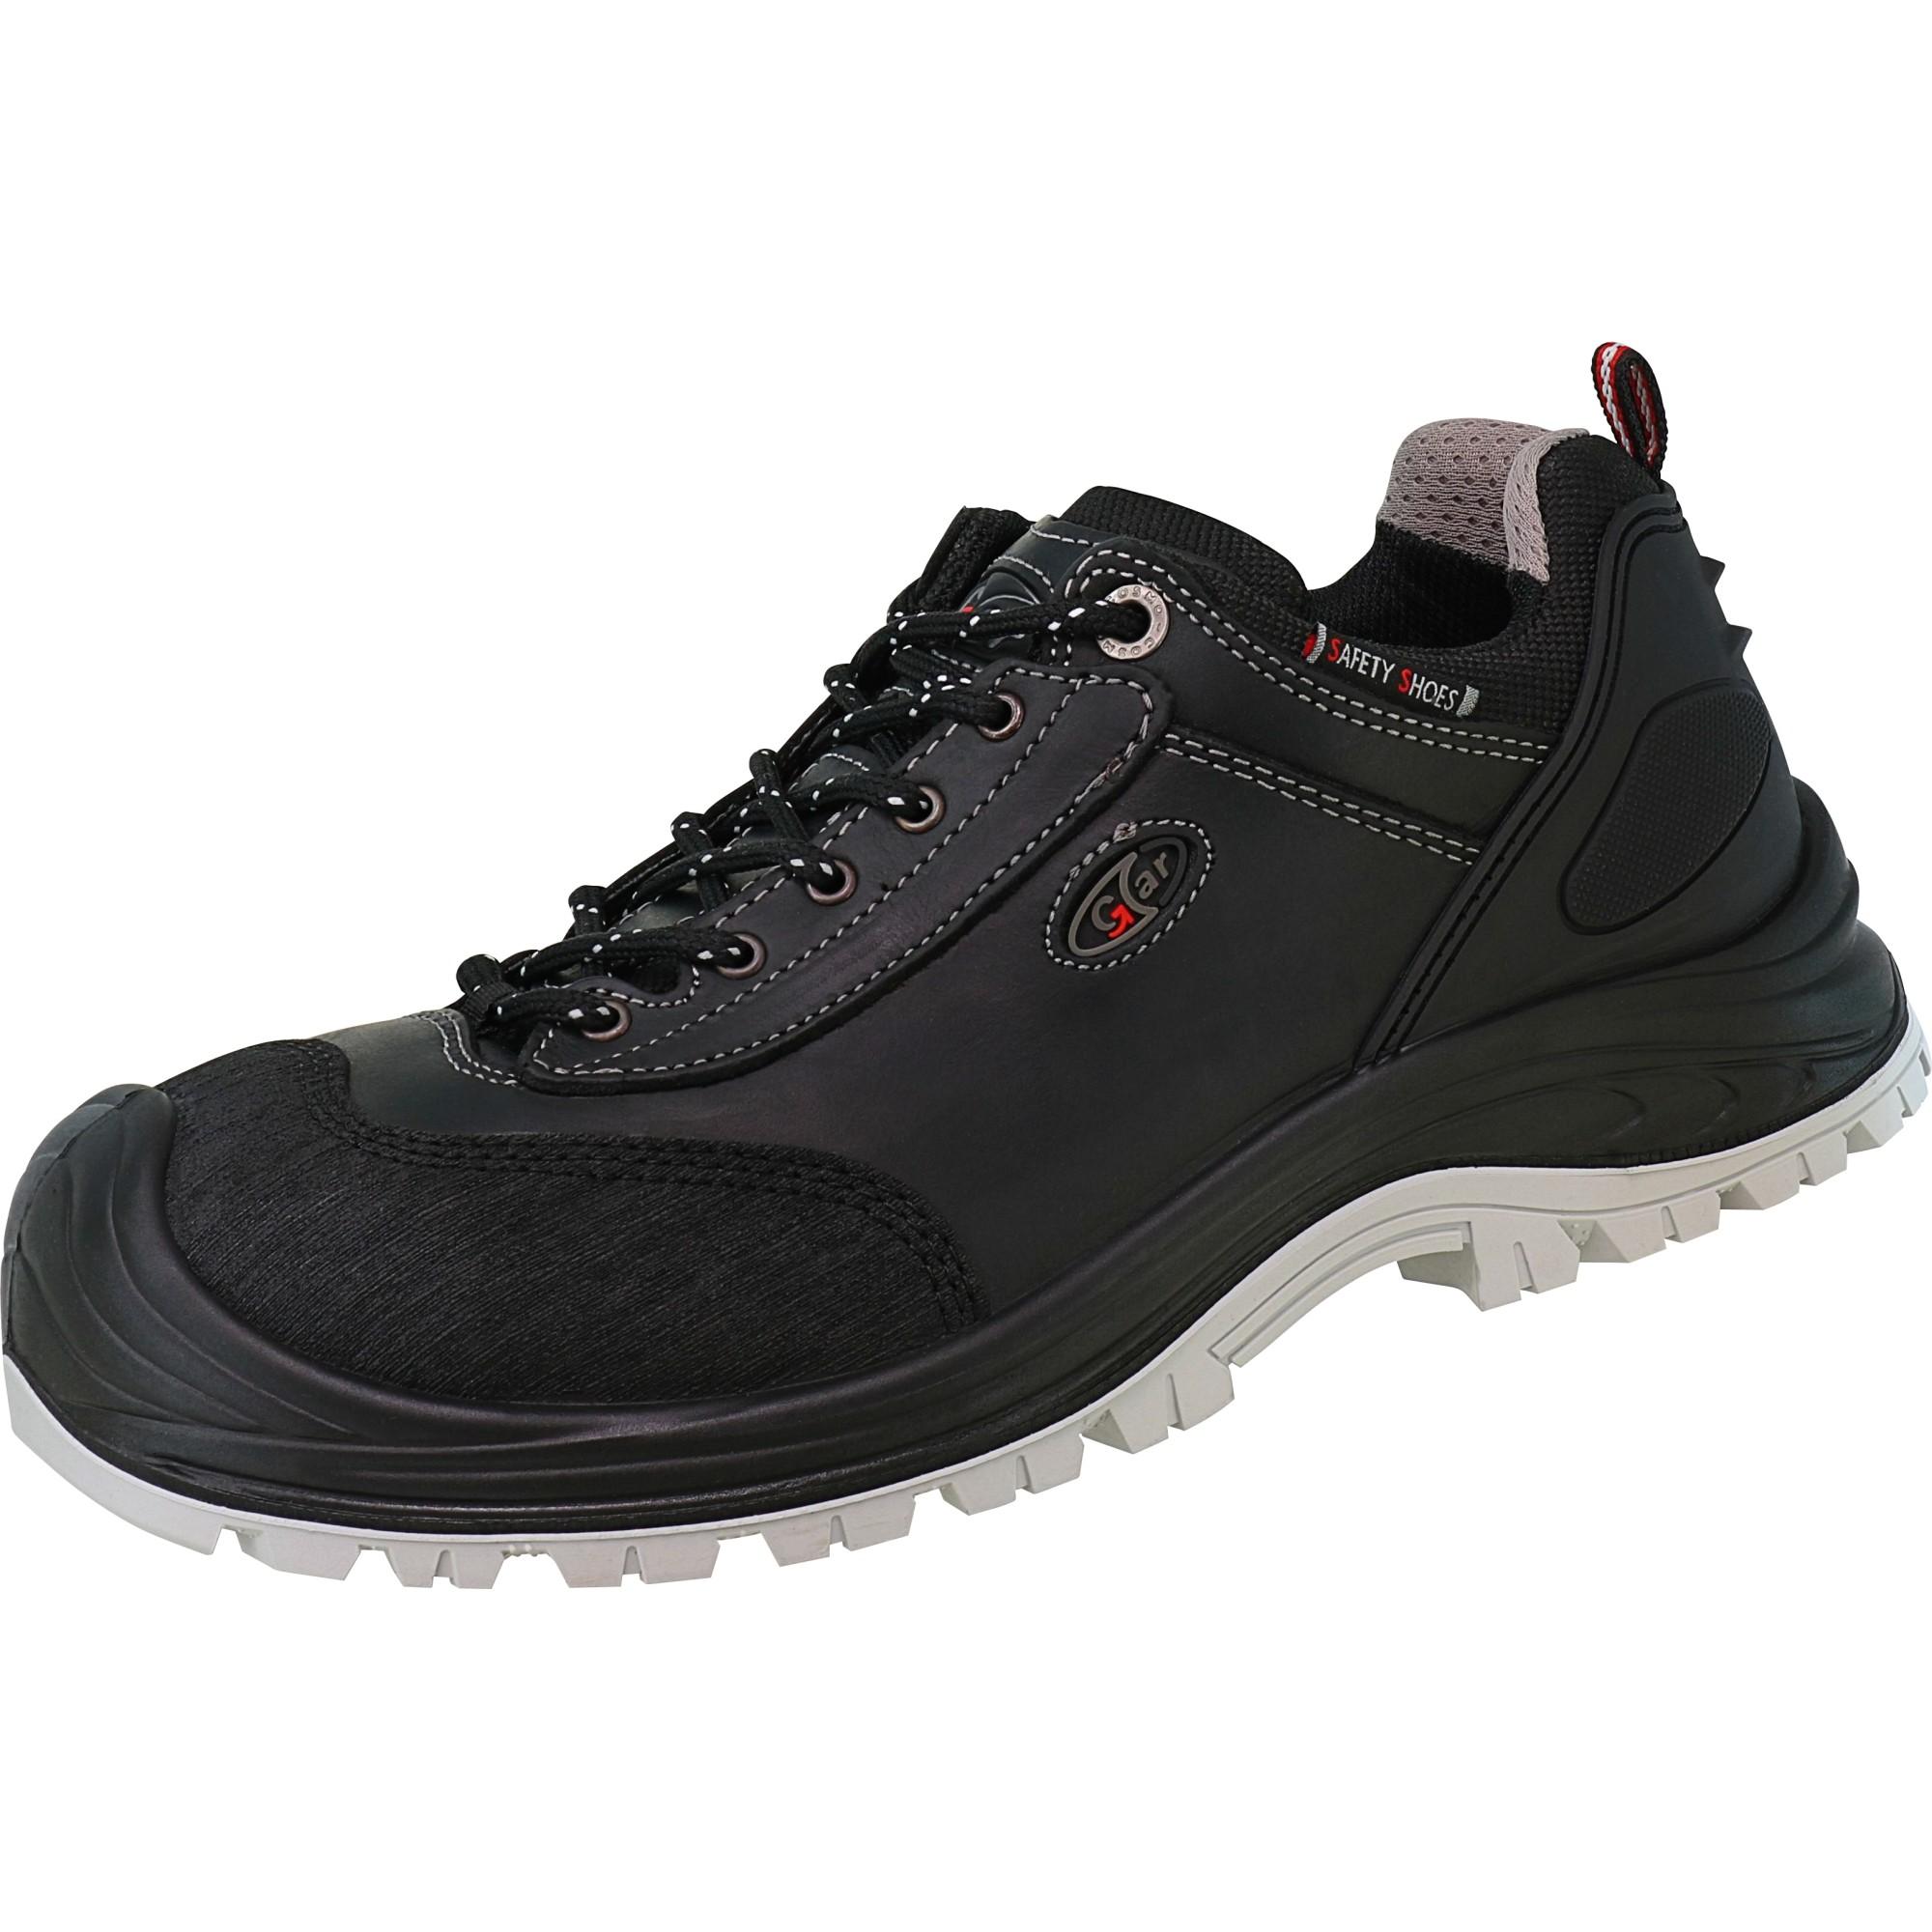 67325413725 TRIUSO Qualitätswerkzeuge GmbH   Workwear   Rhino, Safety footwear